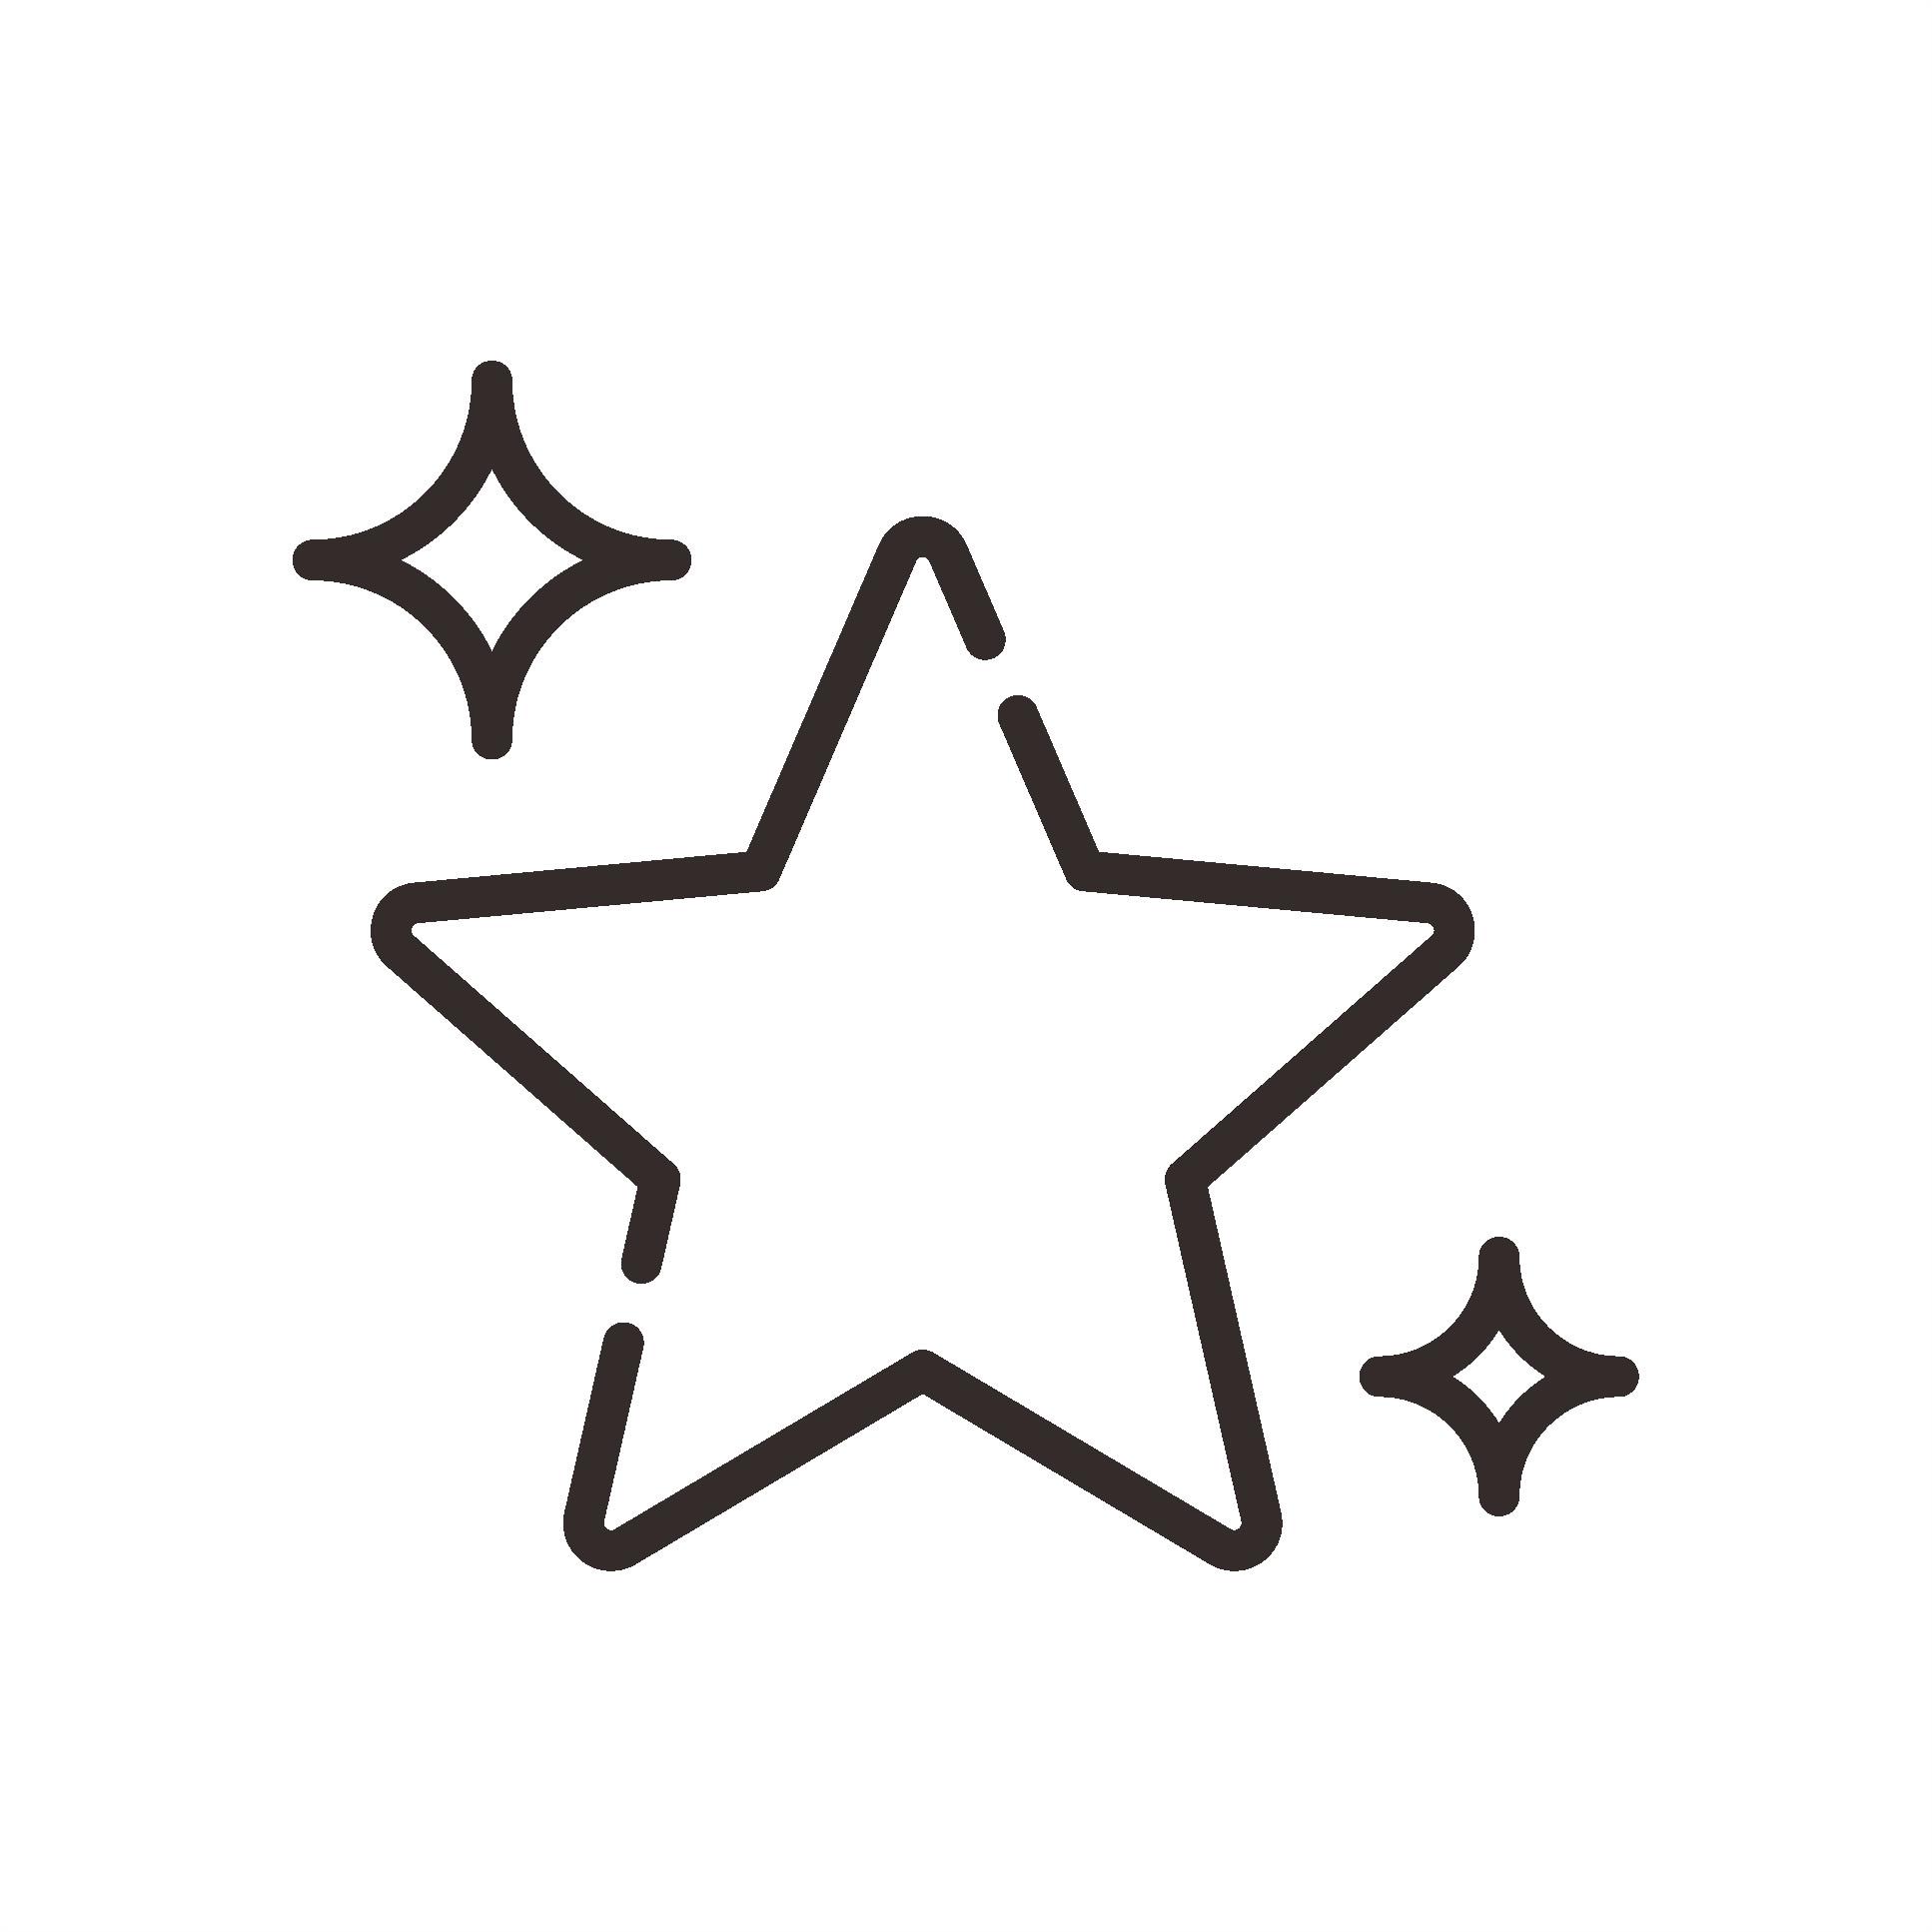 CA6_star